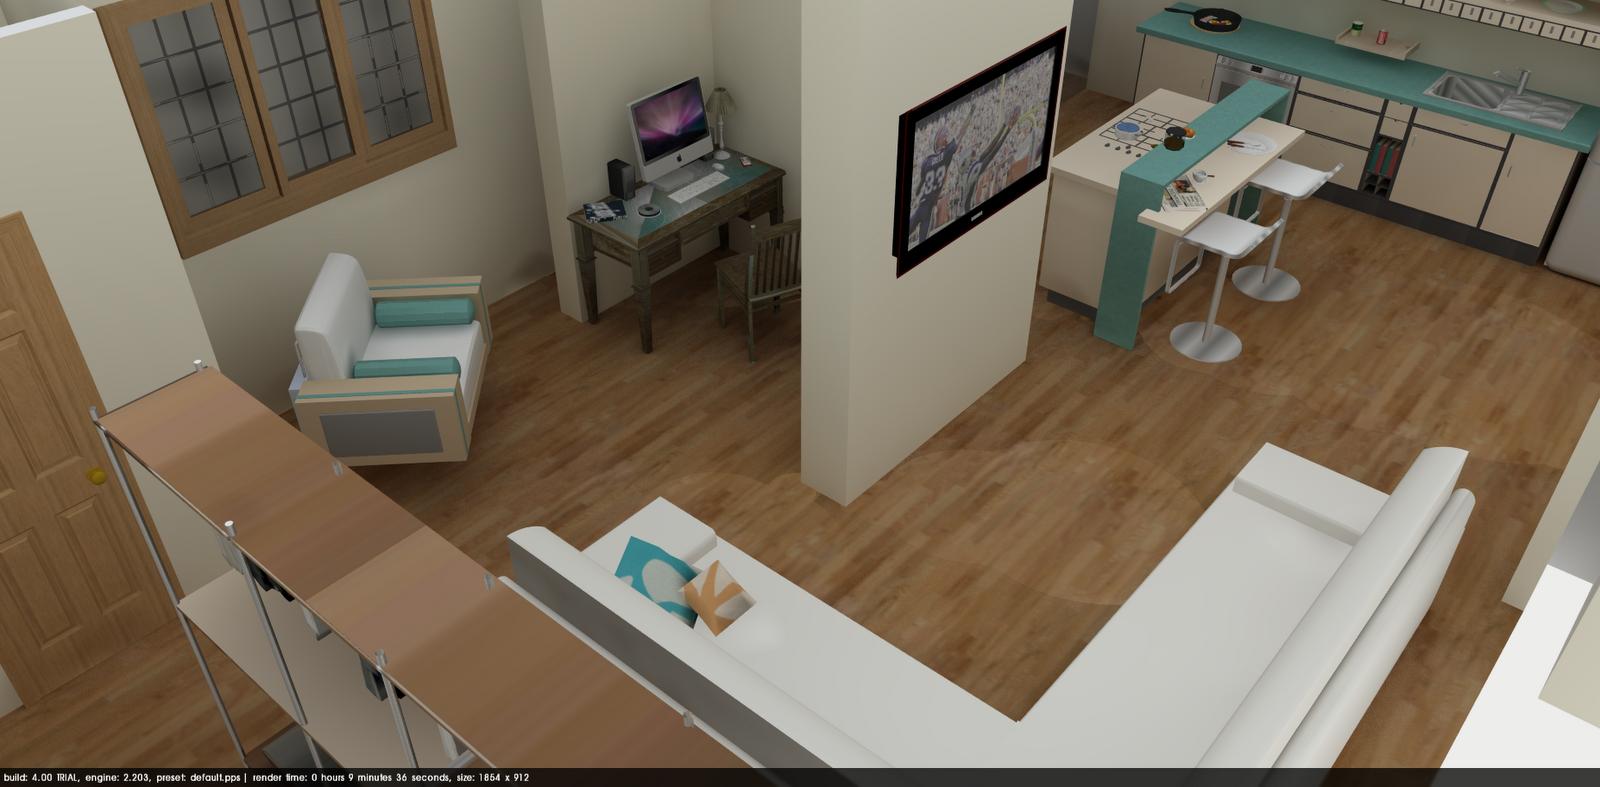 http://1.bp.blogspot.com/-7Dm1RGNeE7Q/Tag-NaMhKxI/AAAAAAAAAAo/5KjqAikifAE/s1600/apartment+2011-03-30+22305100000.png